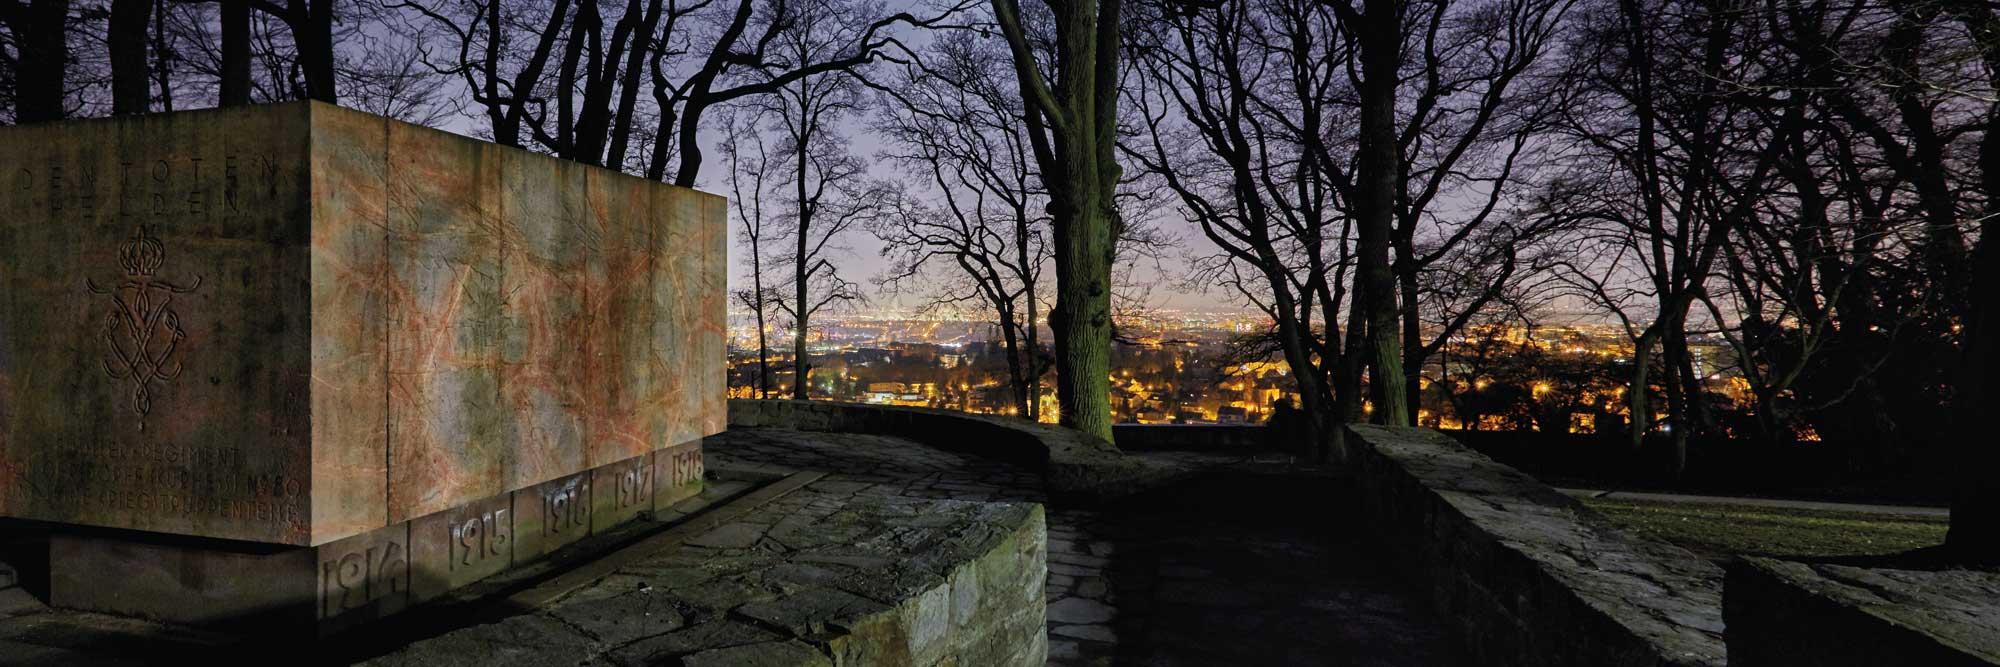 04-Wiesbaden-Kriegerdenkmal-Kriegsdenkmal-5v4